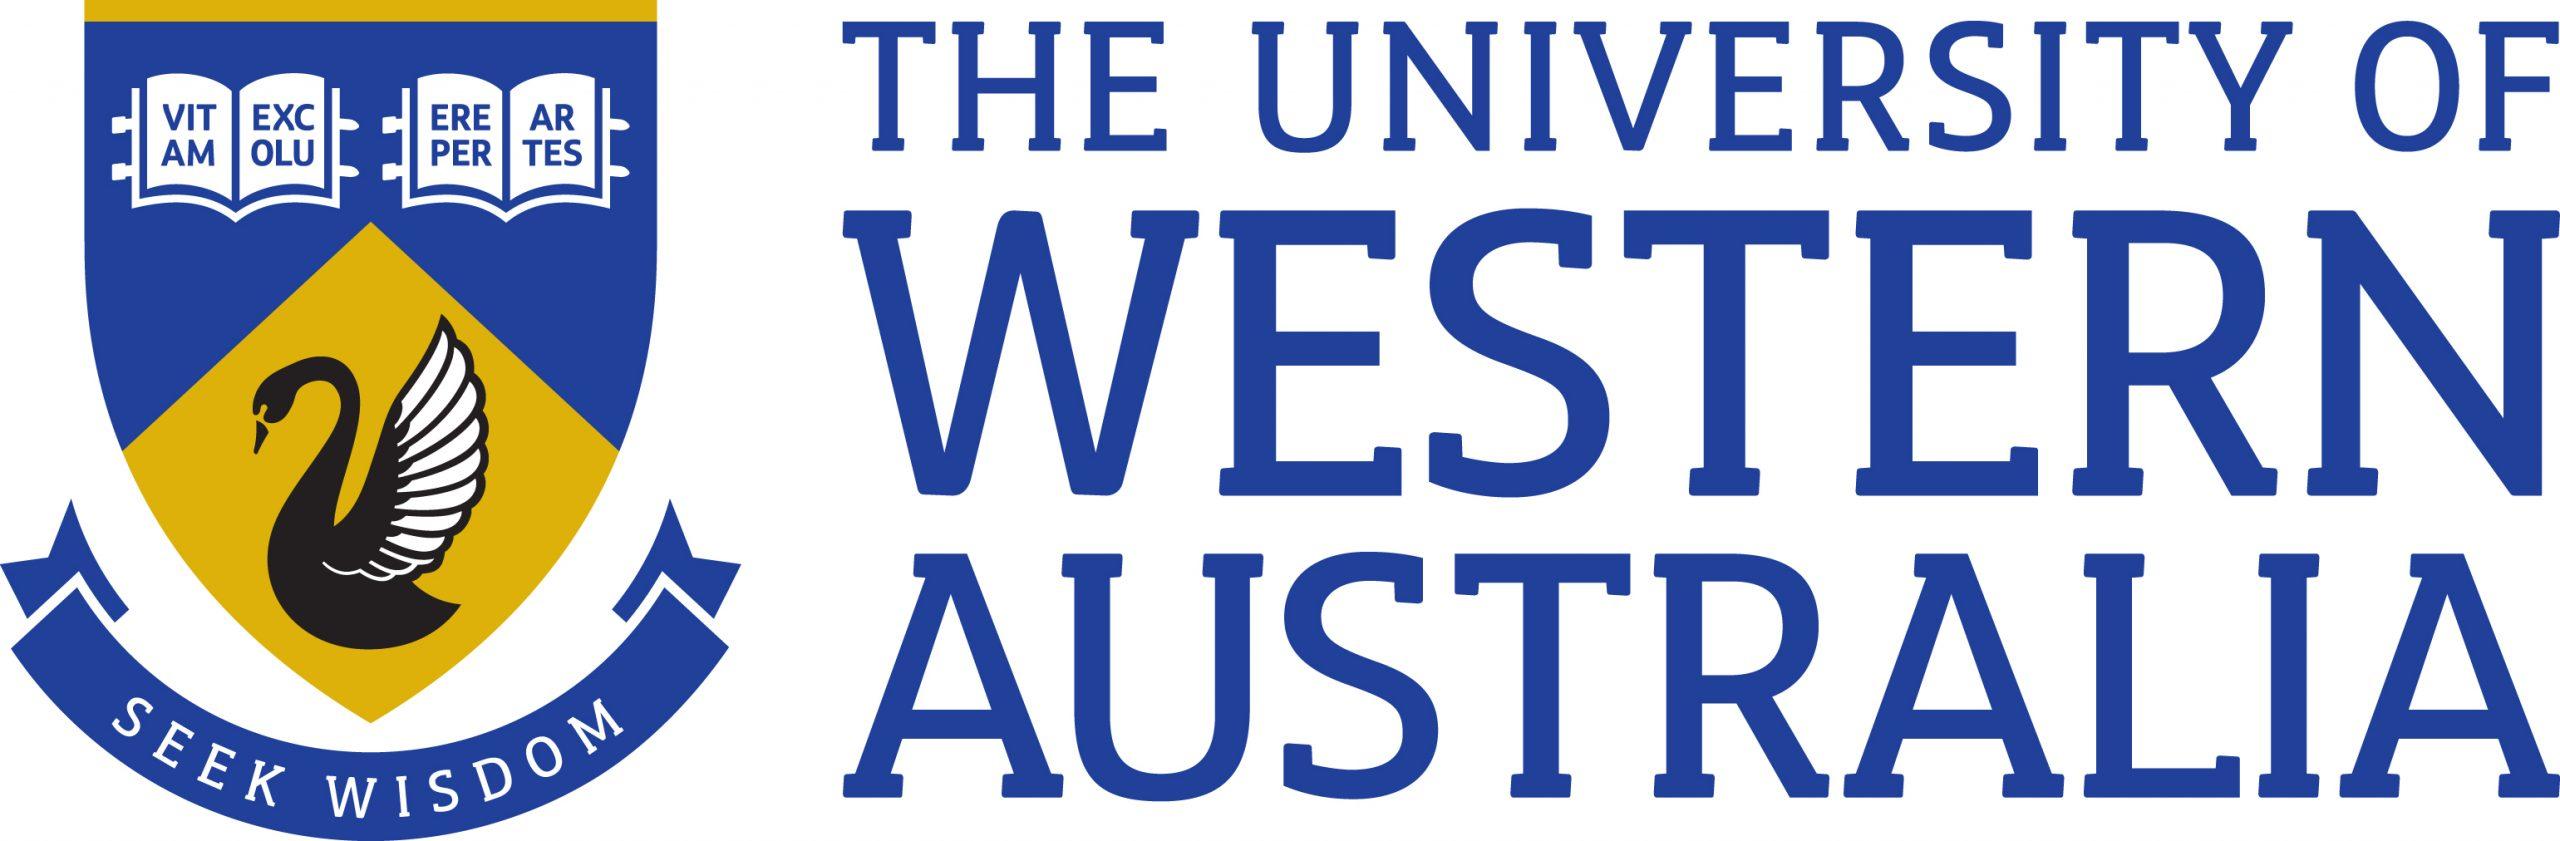 University of Western Austrailia